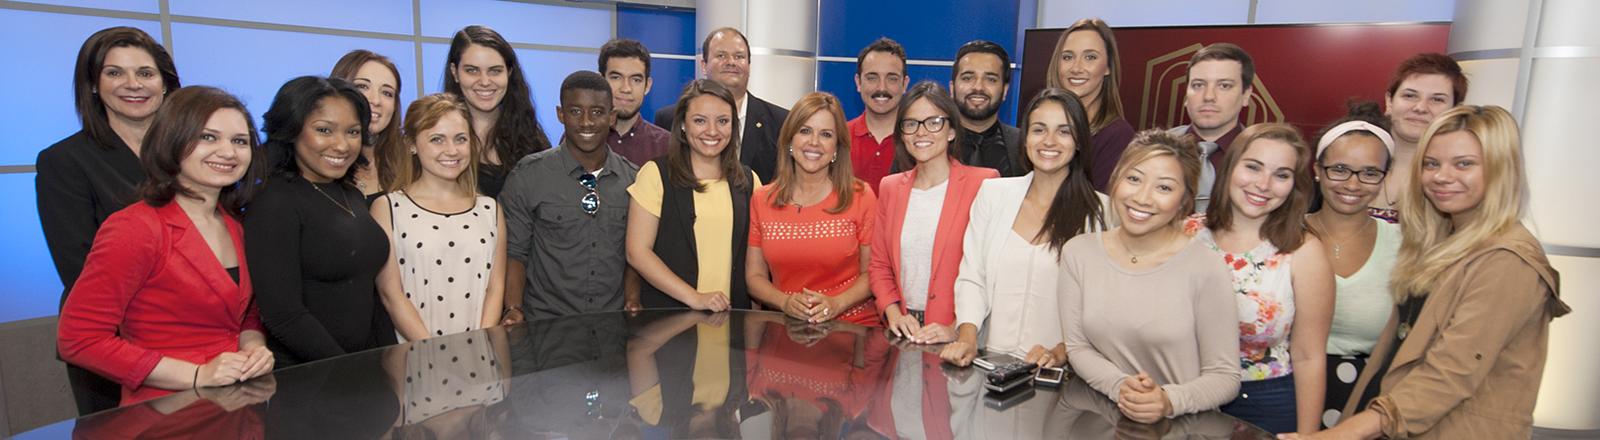 Group Photo in Broadcast Studio